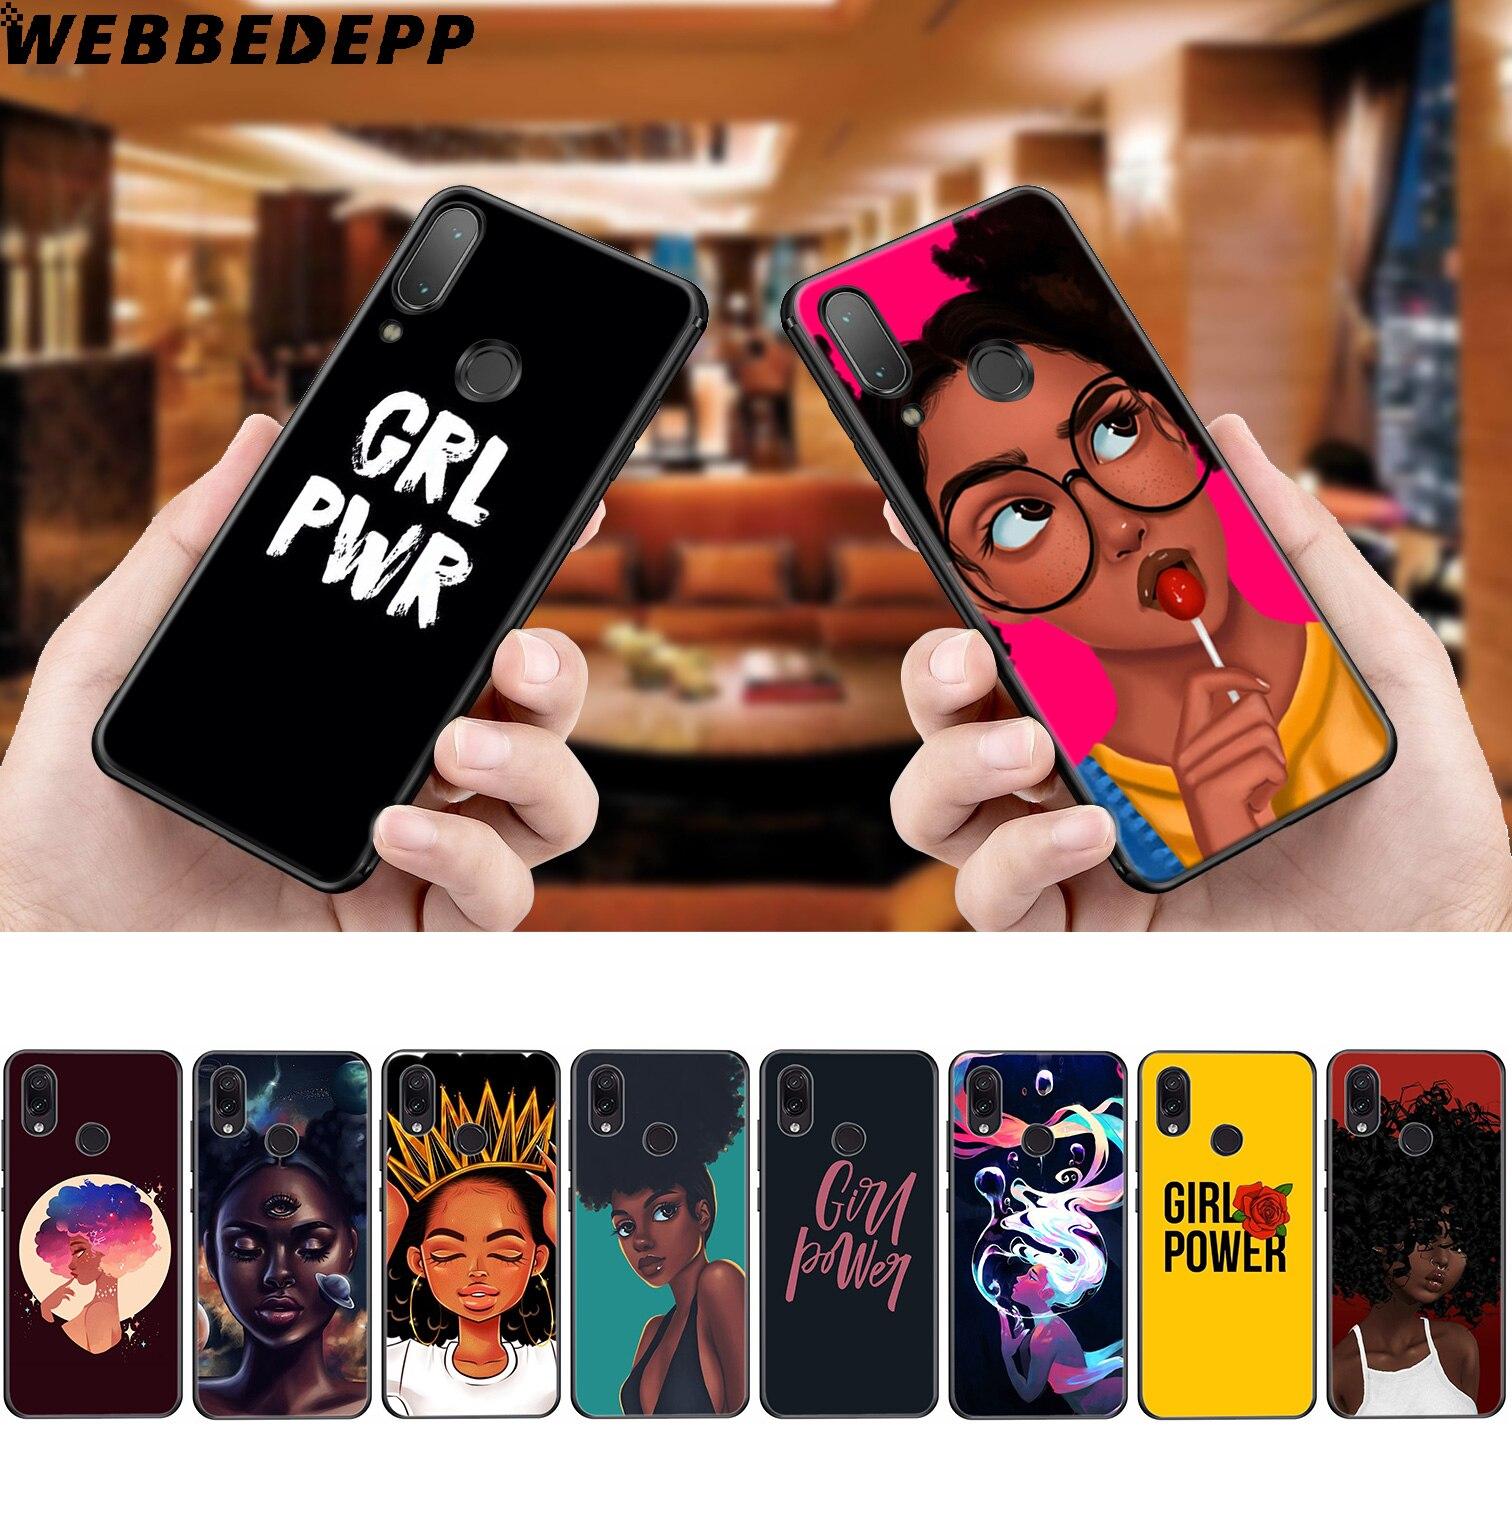 WEBBEDEPP Black Afro Girl Soft Case for Xiaomi Redmi K20 7A 4A 4X 5 5A 6 6A S2 Note 8 4 4X 5 6 5A 7 Pro Plus Prime